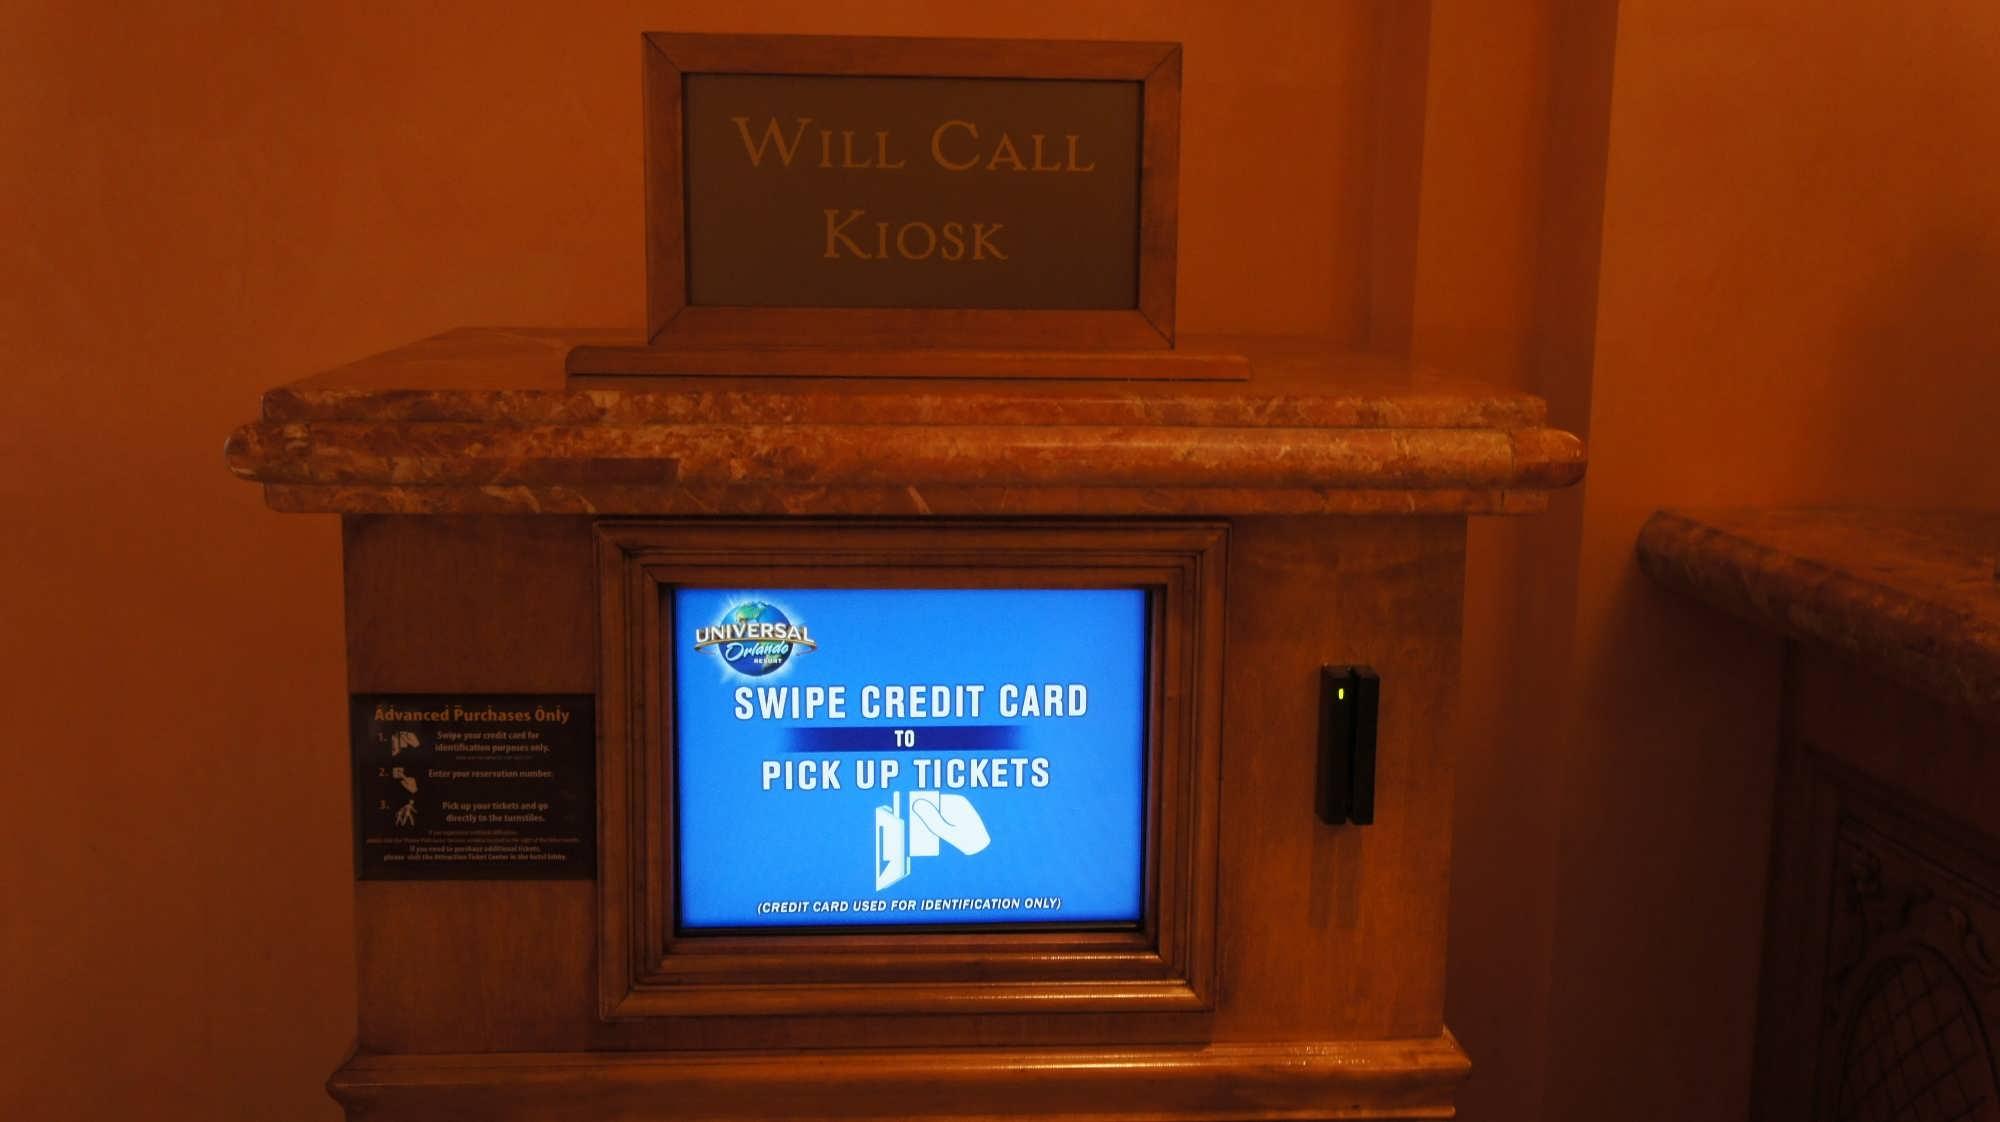 Electronic will call kiosk at Portofino Bay